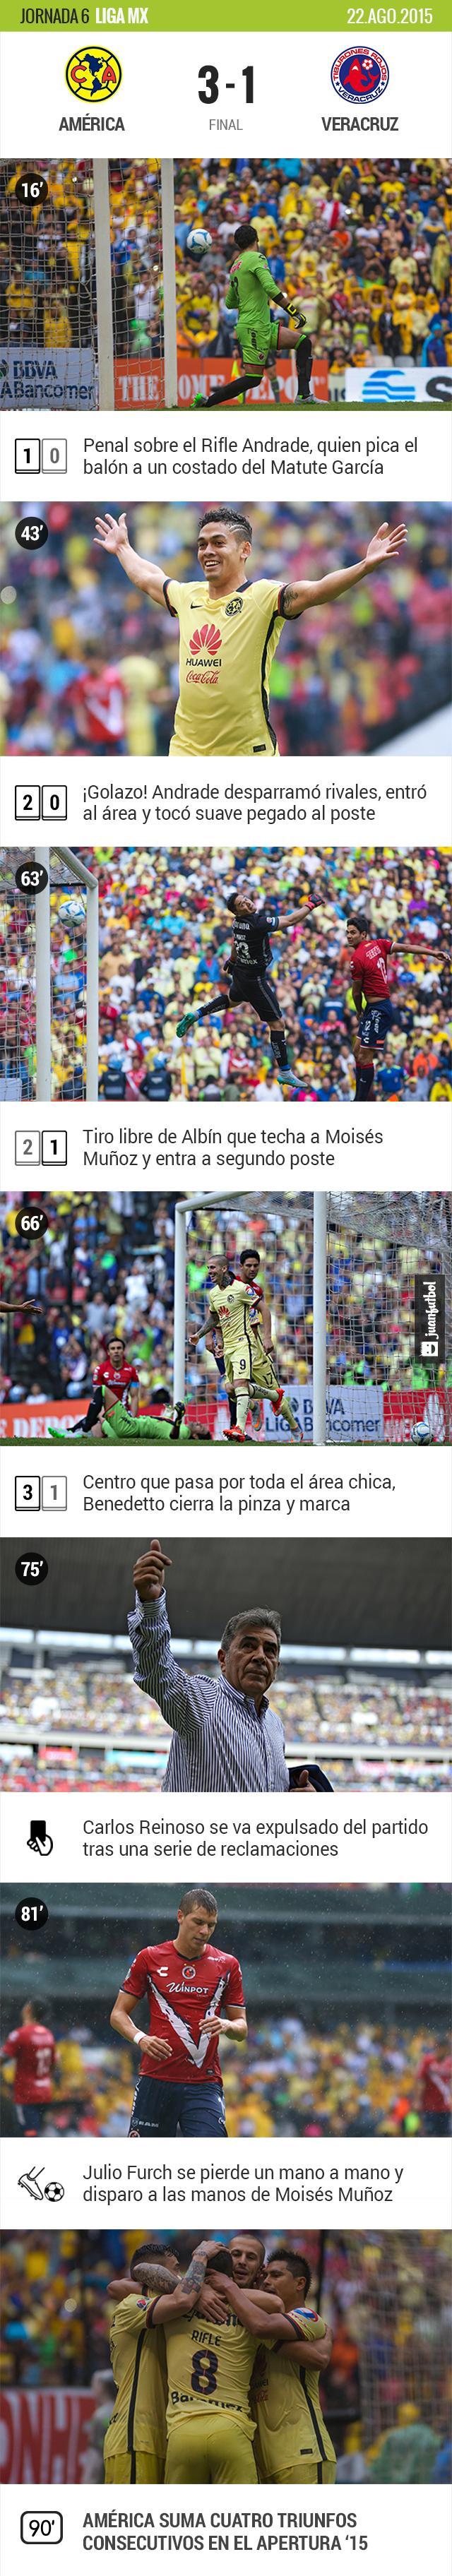 América 3-1 Veracruz